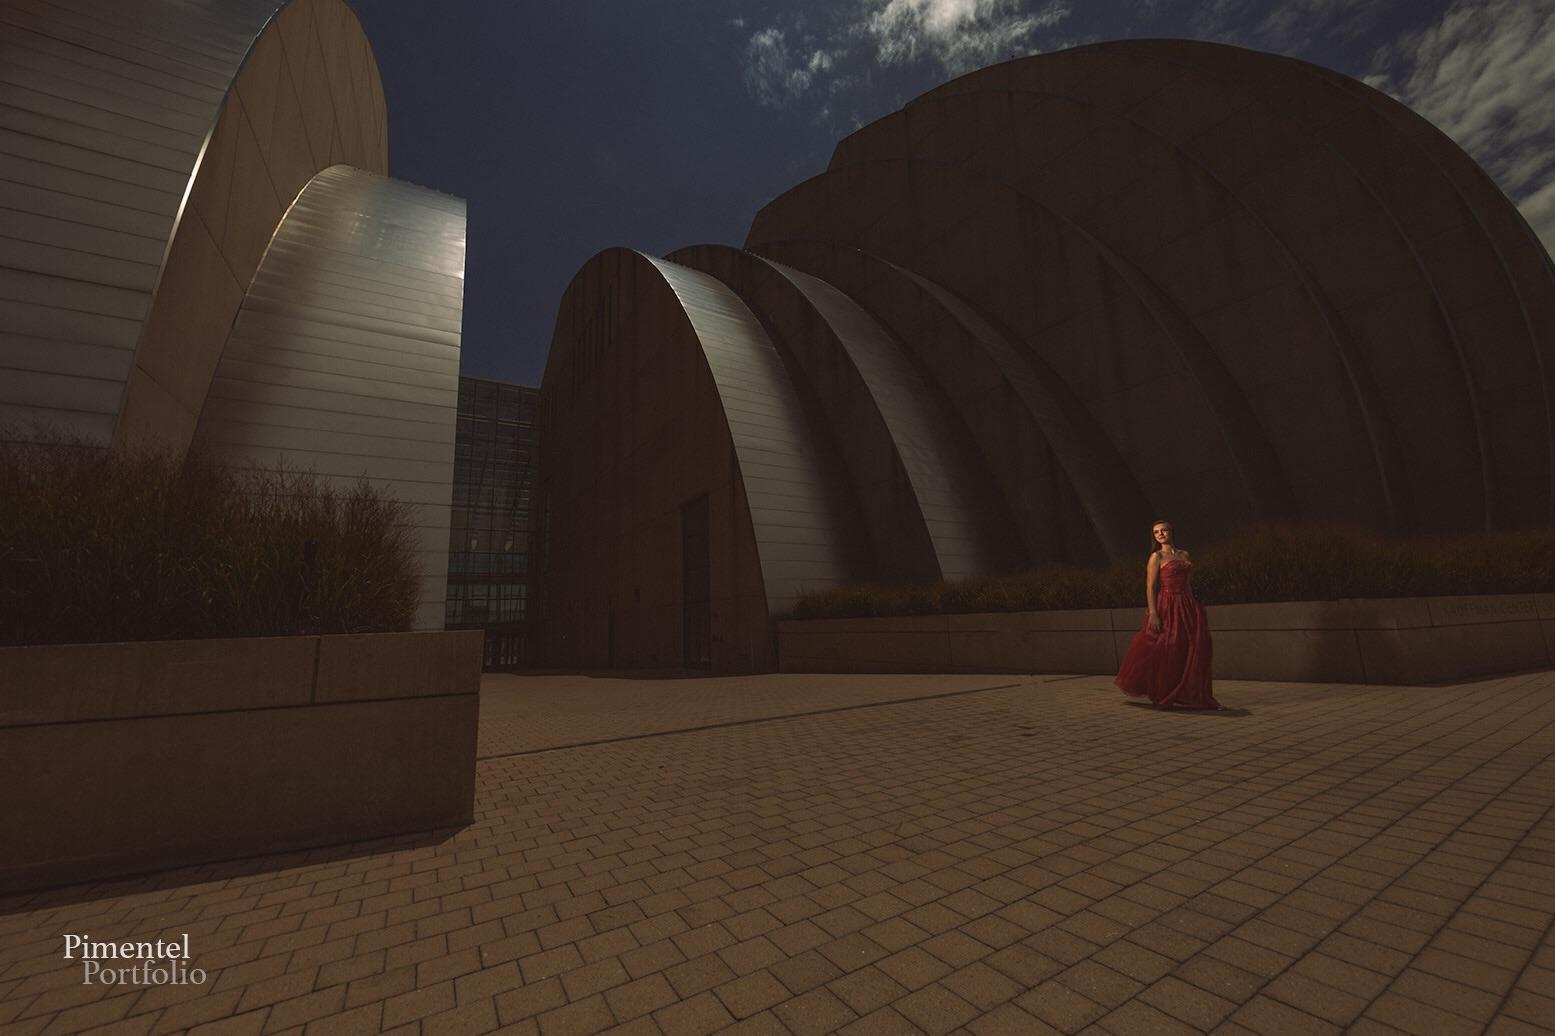 Kansas City landmark the Kauffman provides a backdrop for Amy Stegman's Session